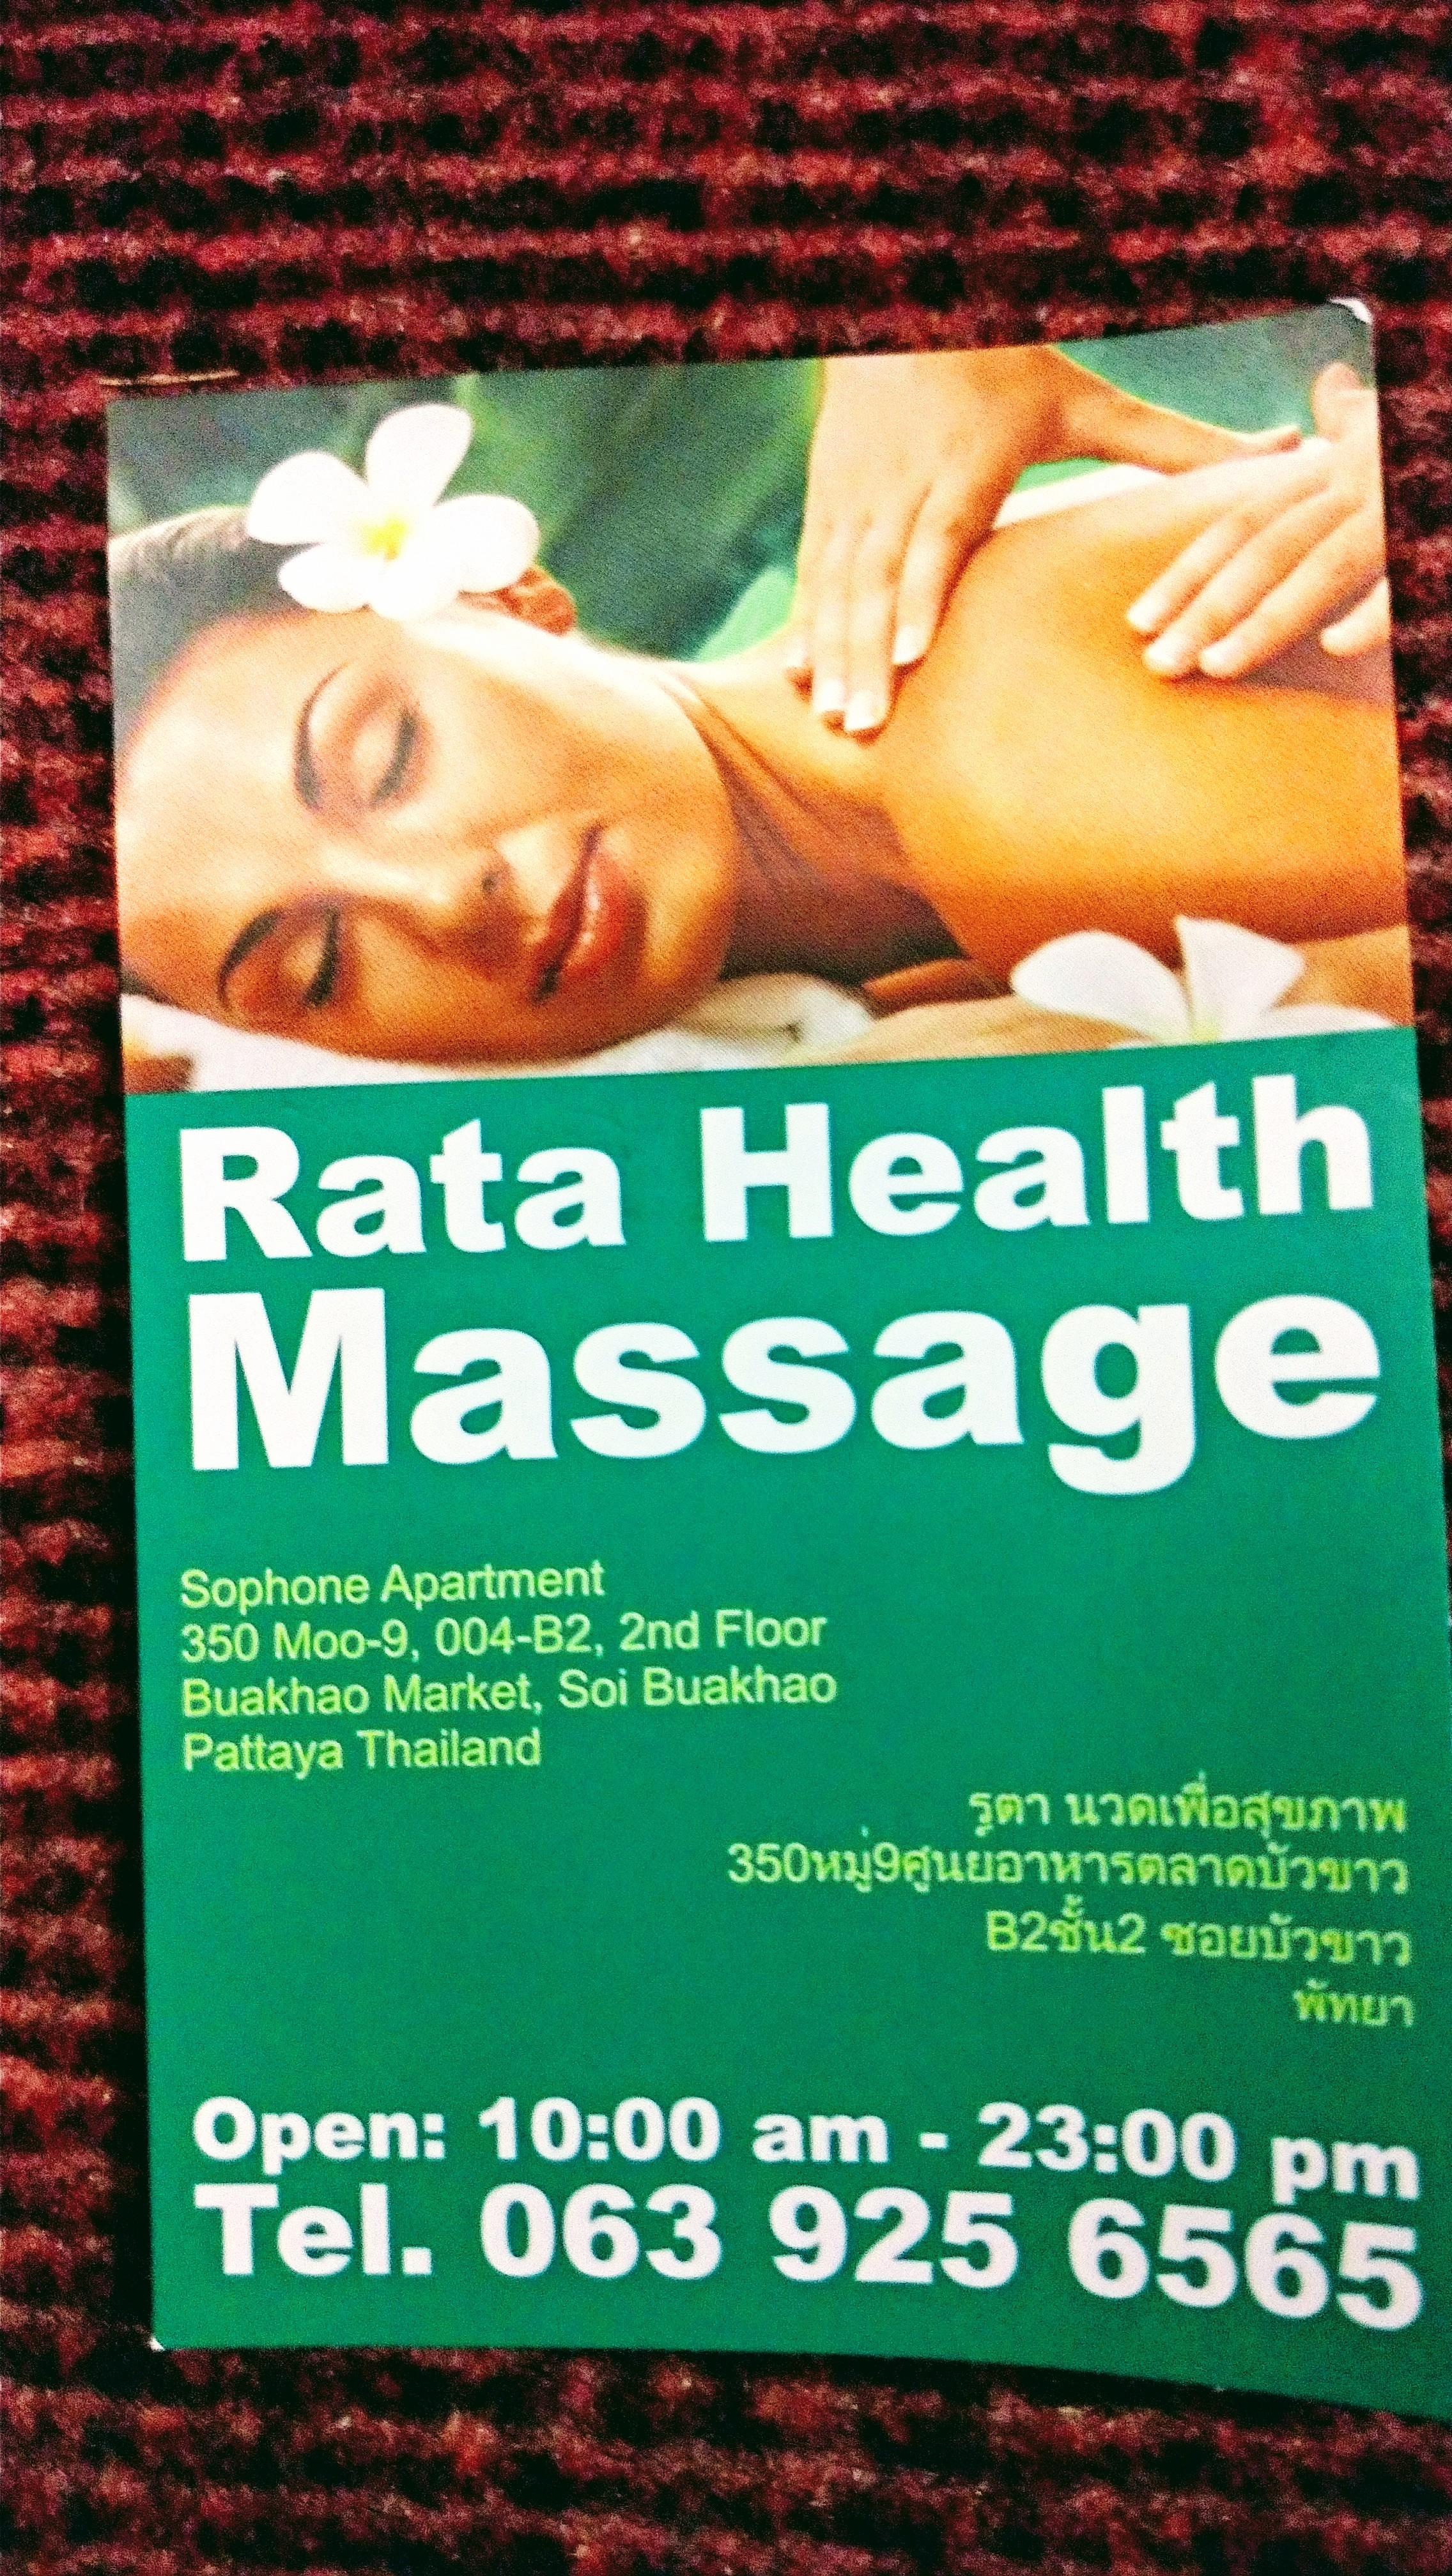 Rata Health Massage